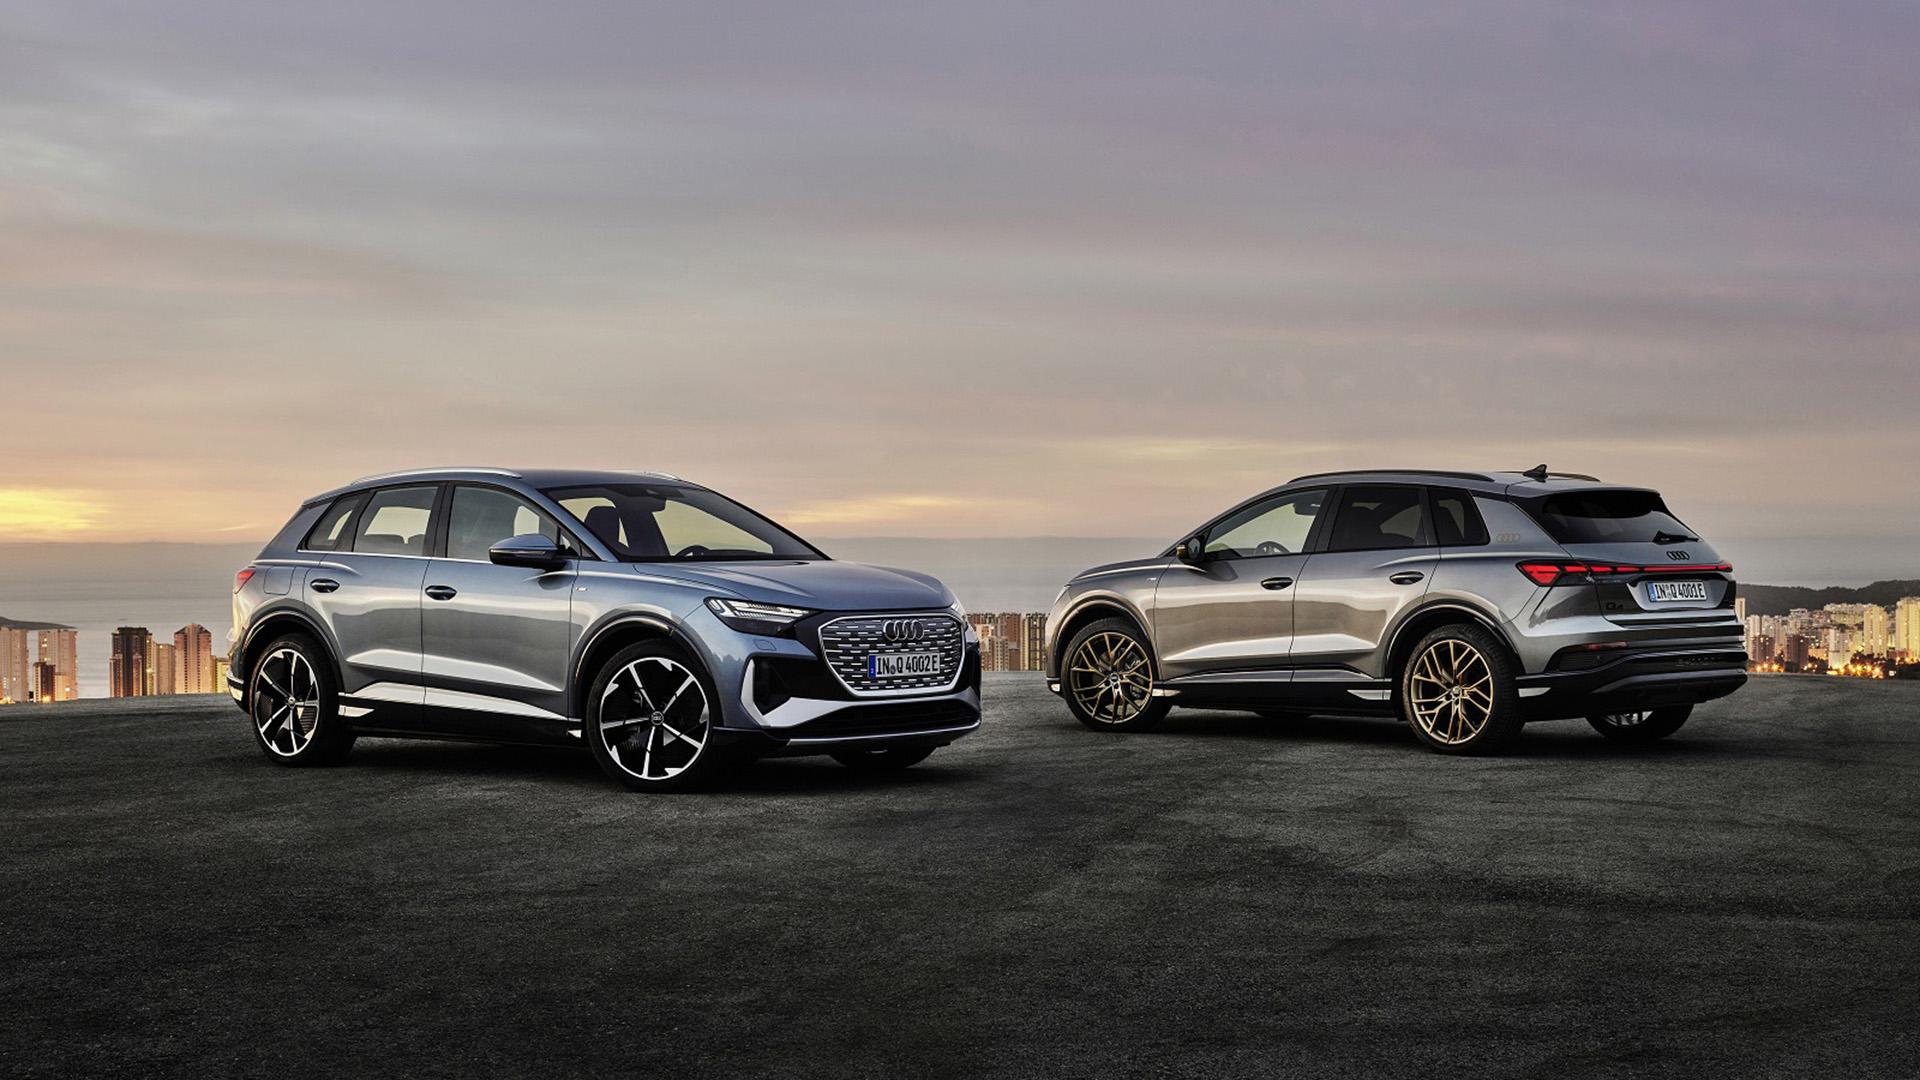 Audi: Παρουσίασε τα νέα ηλεκτρικά Q4 e-tron και Q4 Sportback e-tron (video)